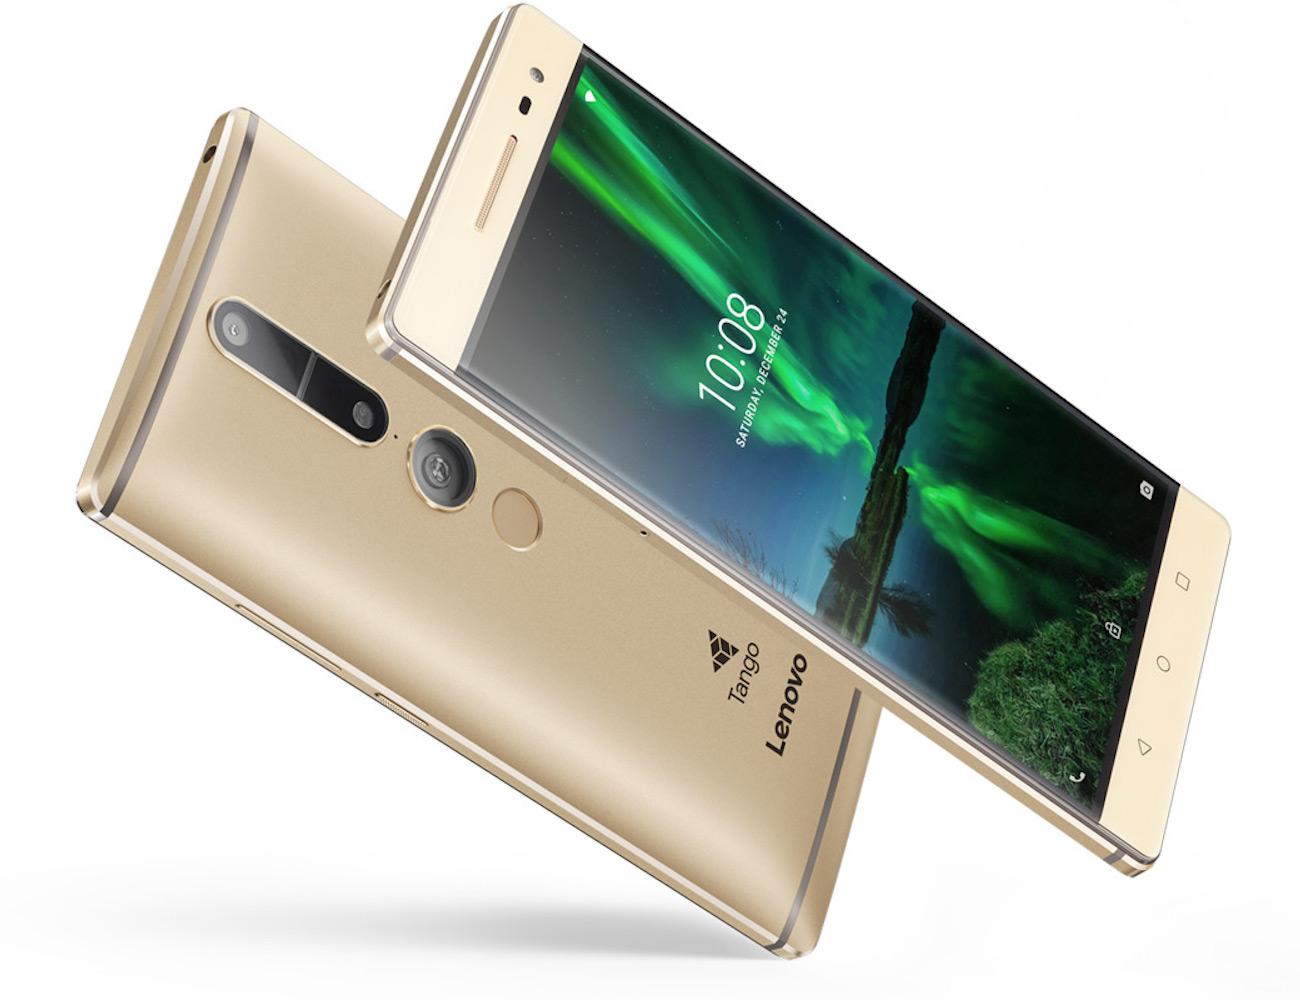 lenovo-phab2-pro-smartphone-02